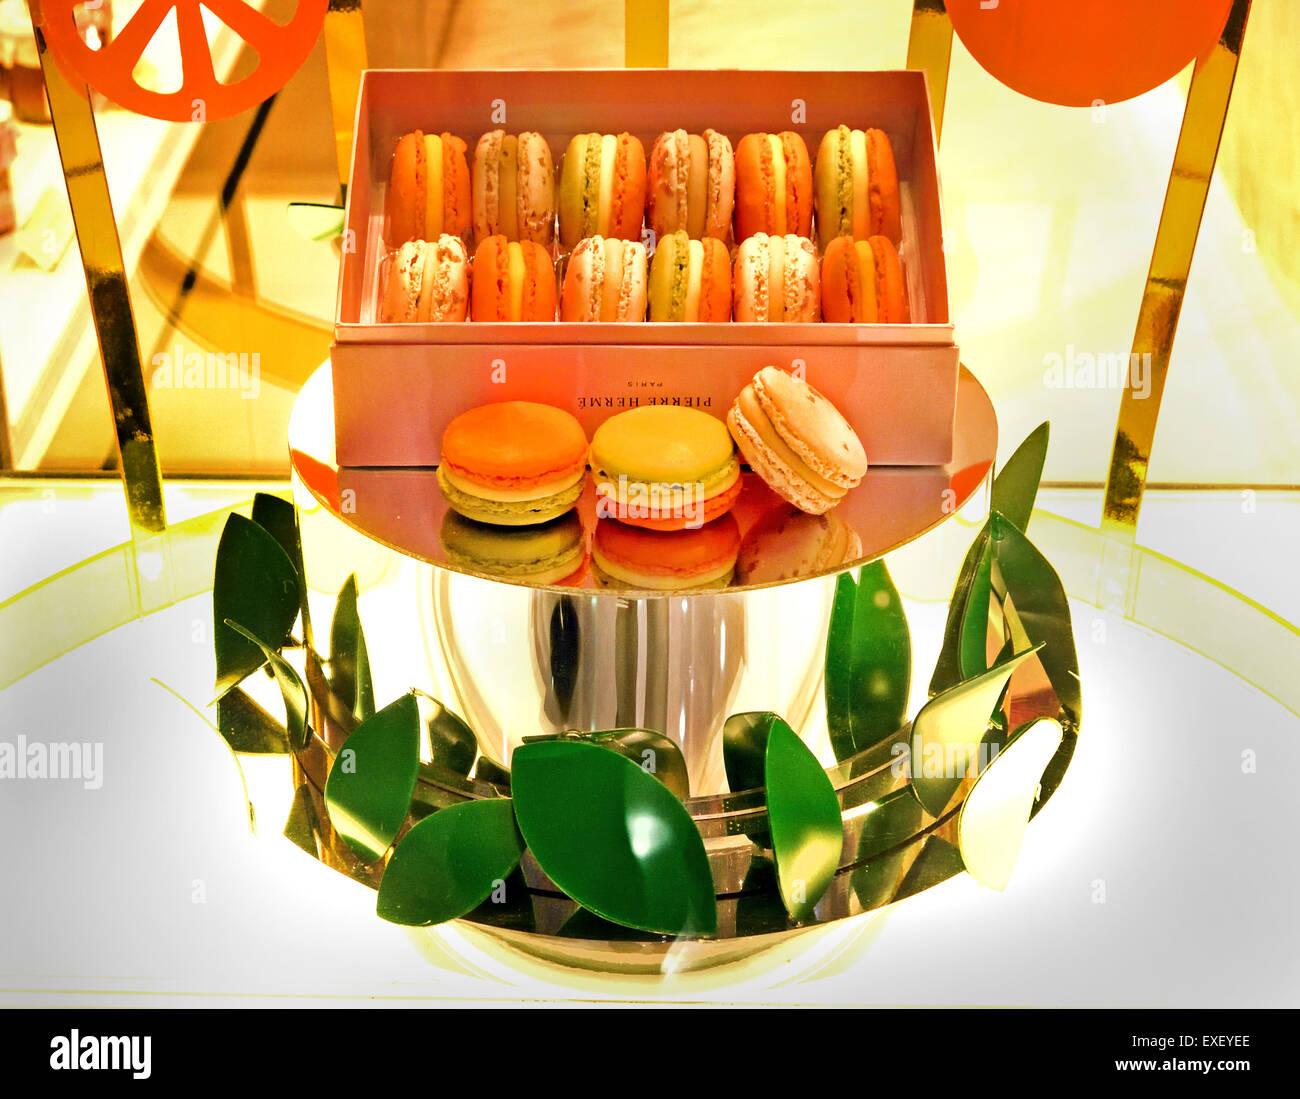 Pierre Herme Chocolate and Macaroon Bakery Shop Hong Kong China Chinese - Stock Image